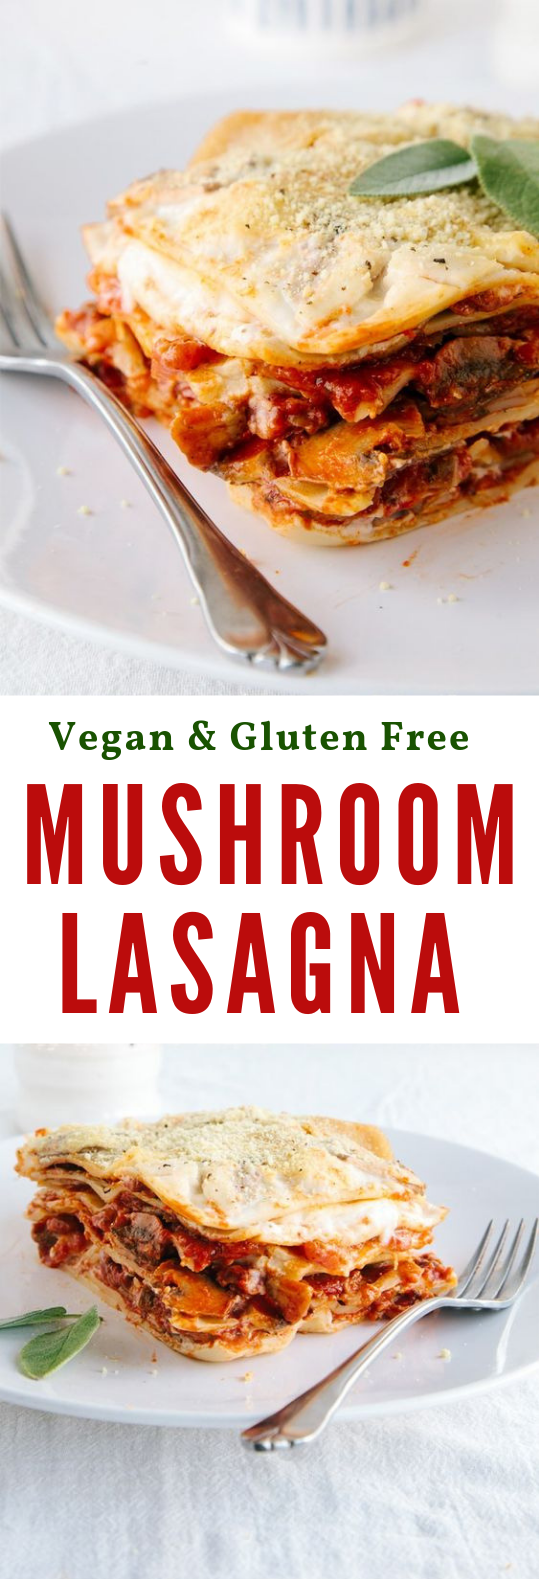 MUSHROOM LASAGNA (VEGAN + GF) #Vegan #Lasagna